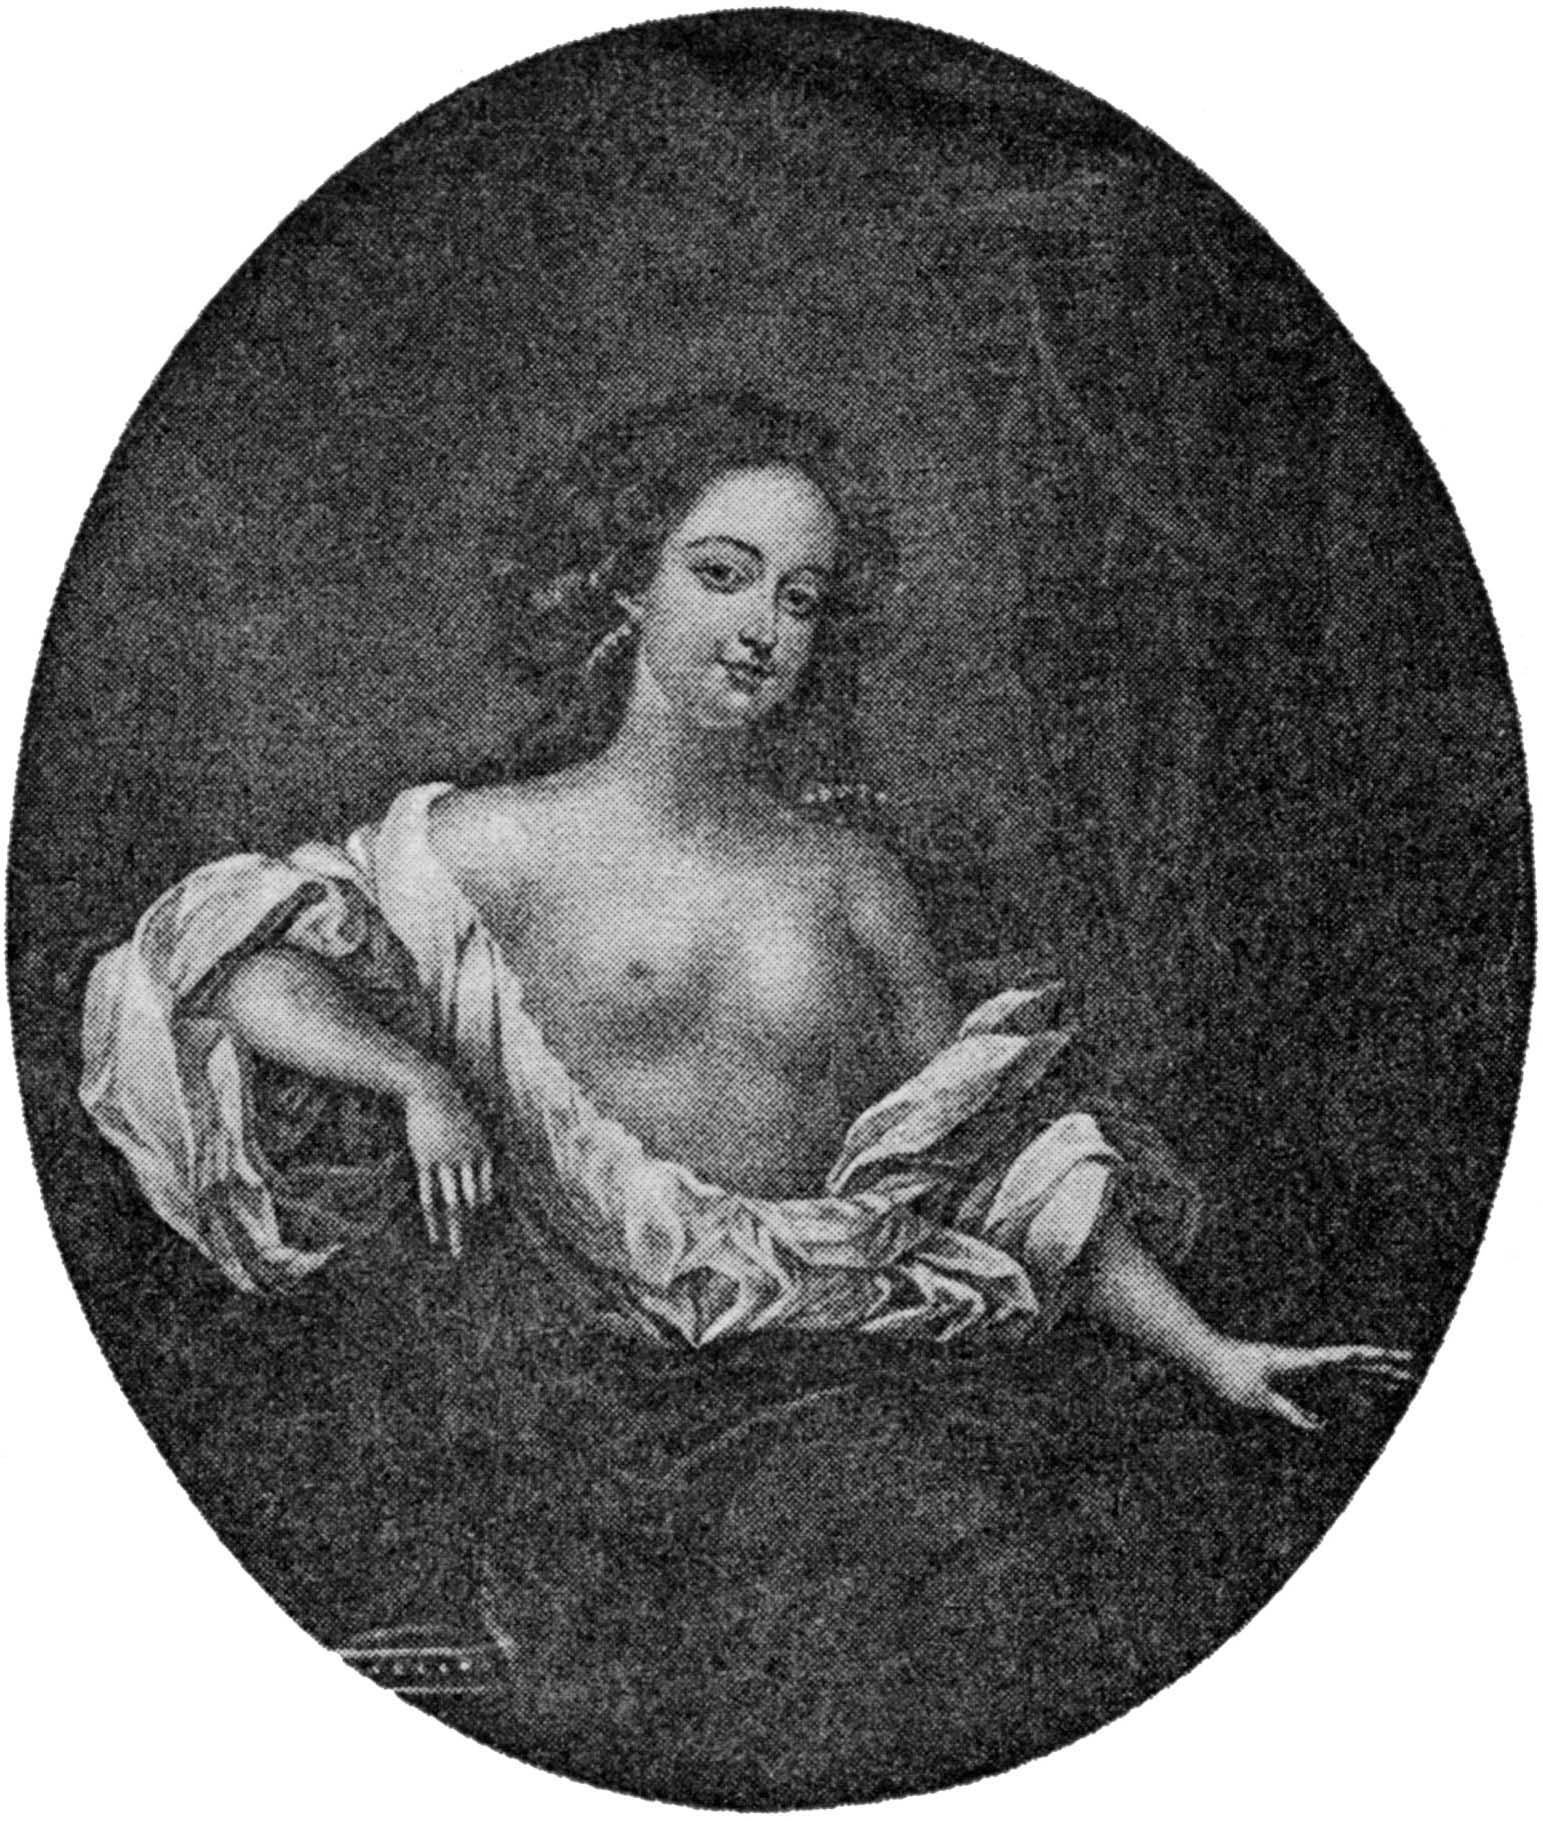 Titelbild Schwester Monika 1815